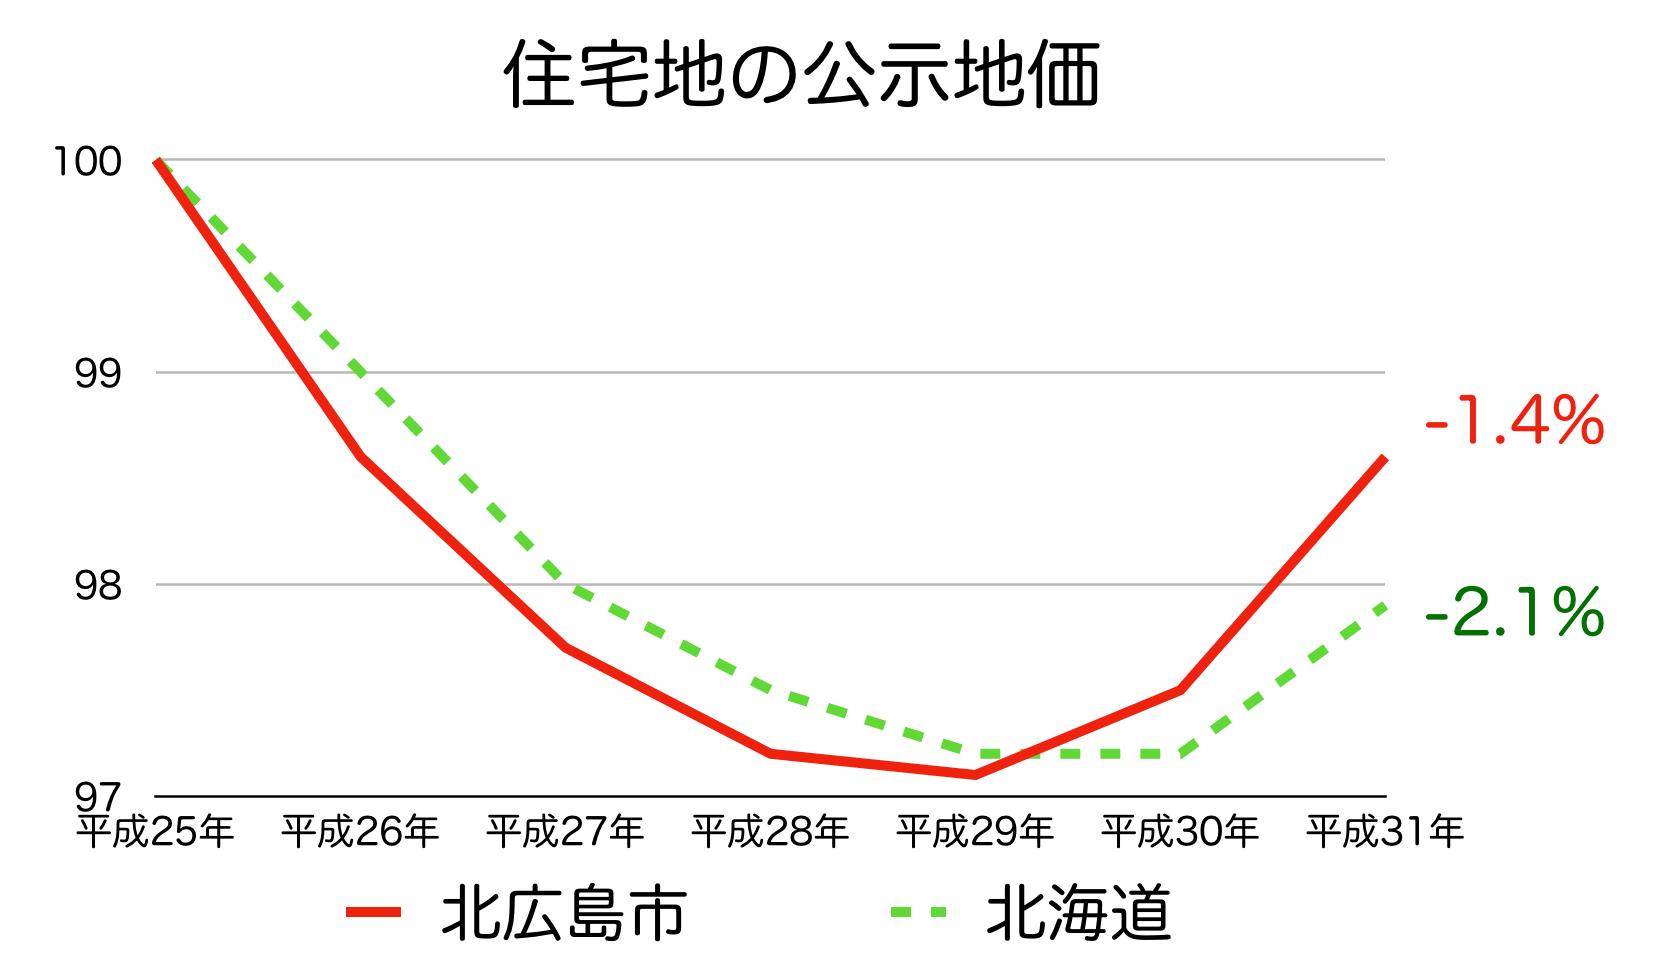 北広島市の公示地価 H25-H31